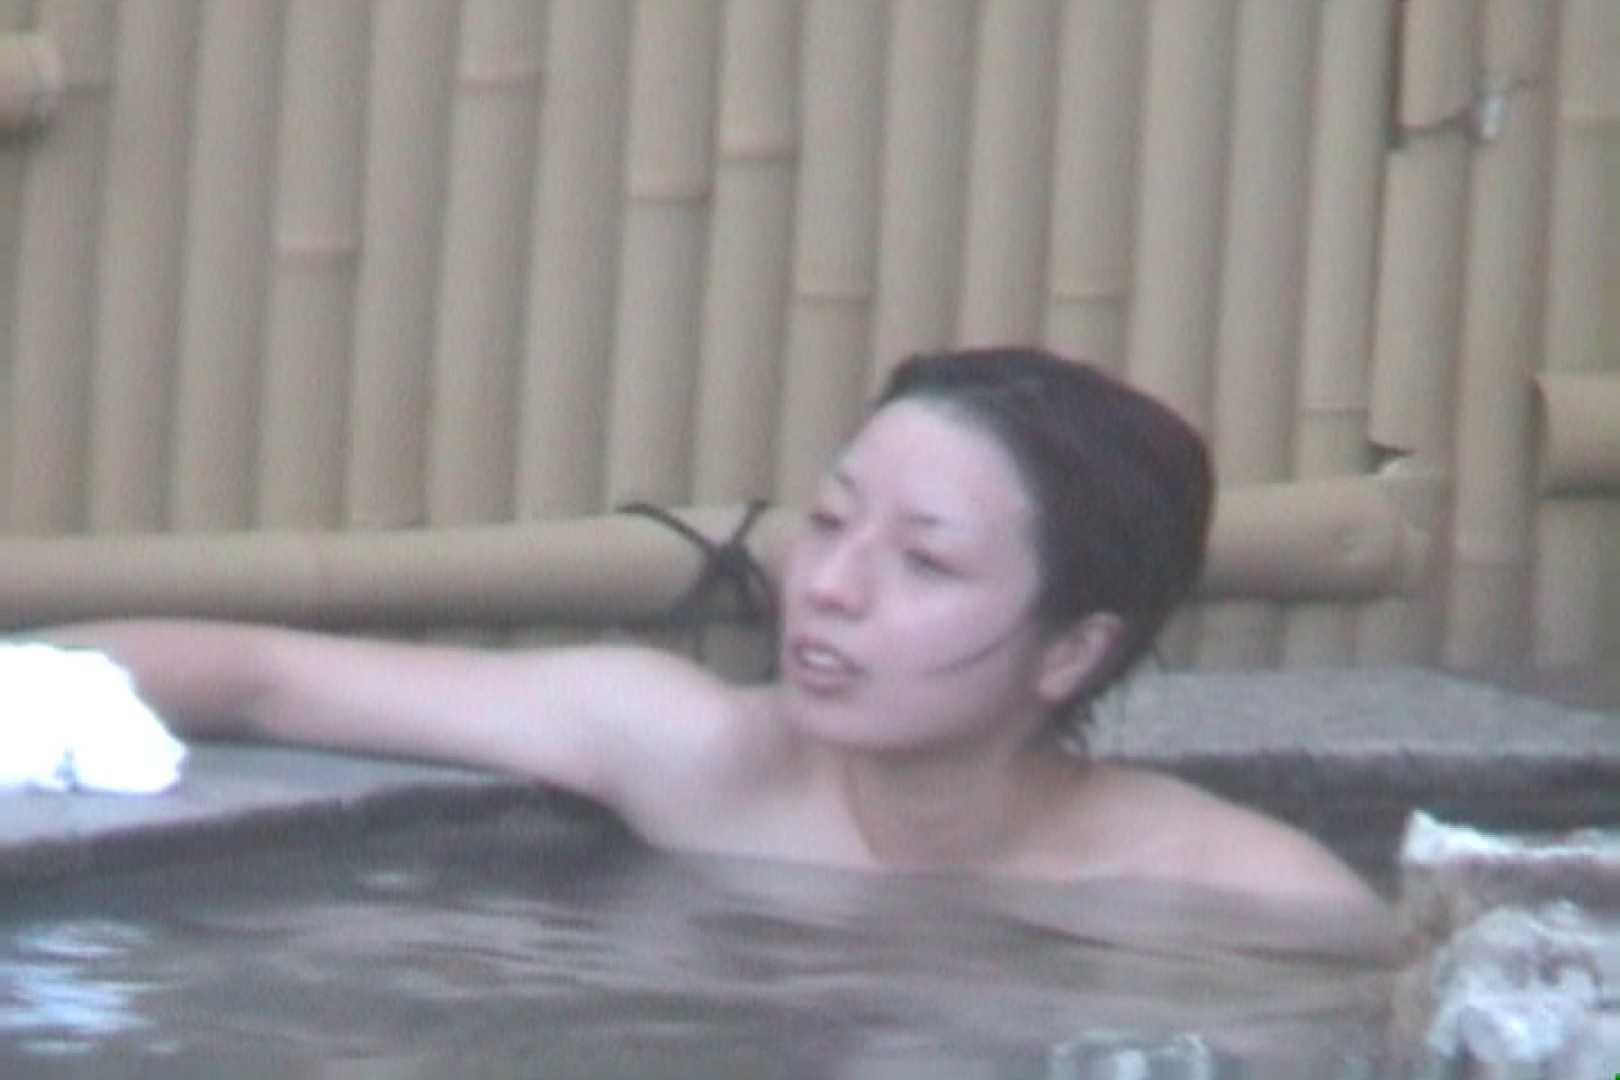 Aquaな露天風呂Vol.608 露天風呂 | OLのエロ生活  69連発 46